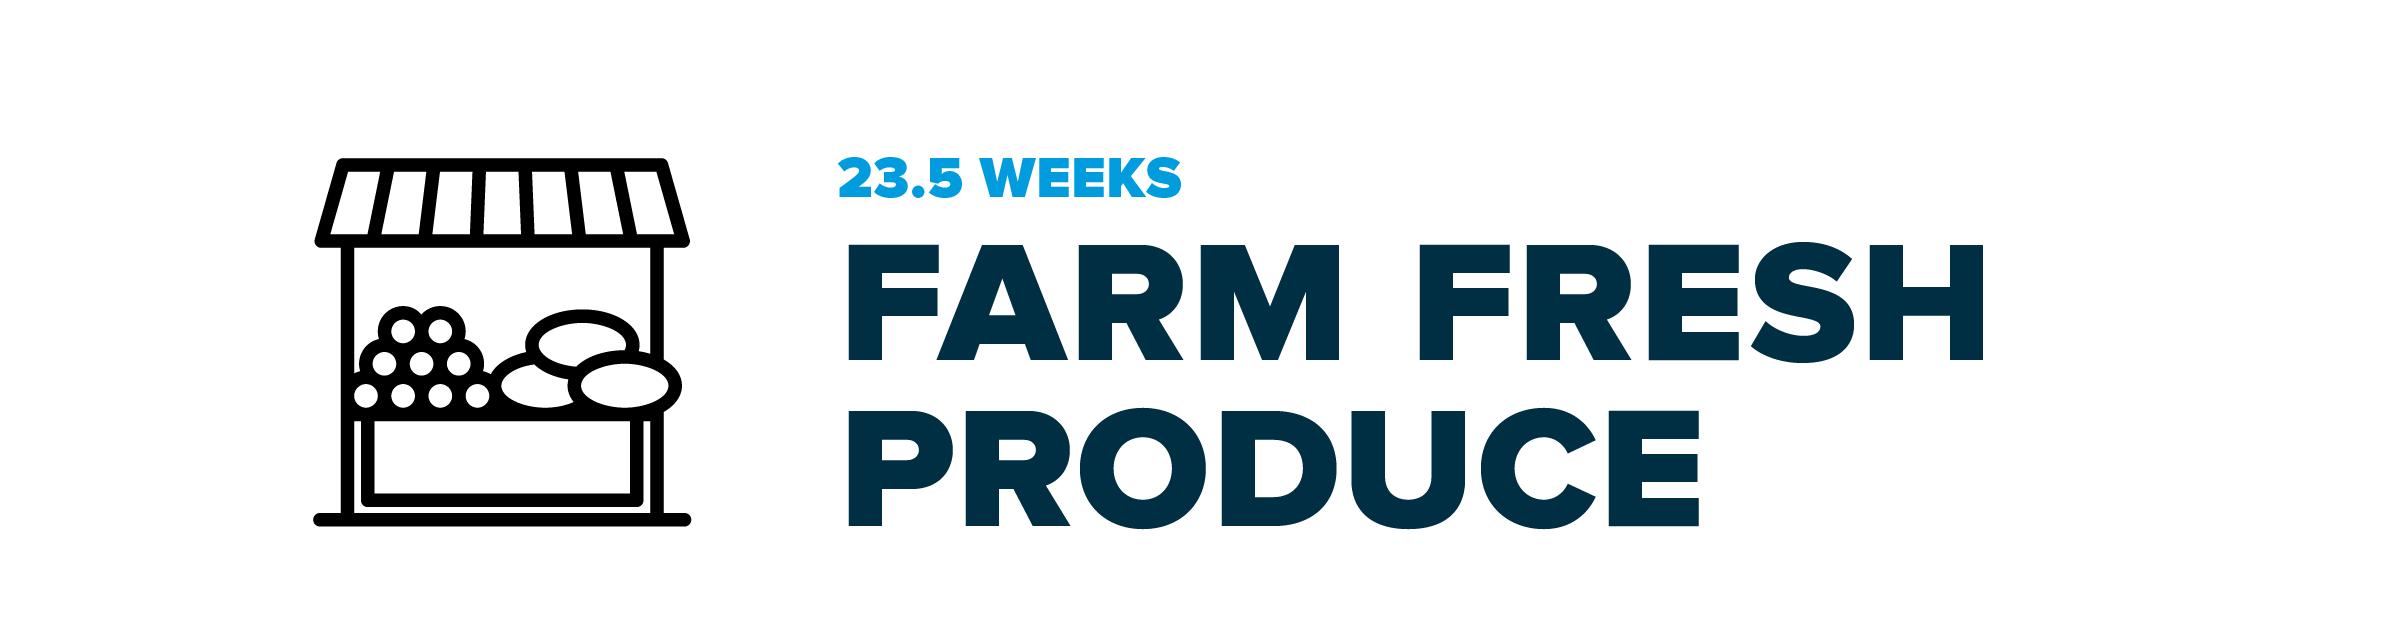 Infographic-06-farmfresh.png